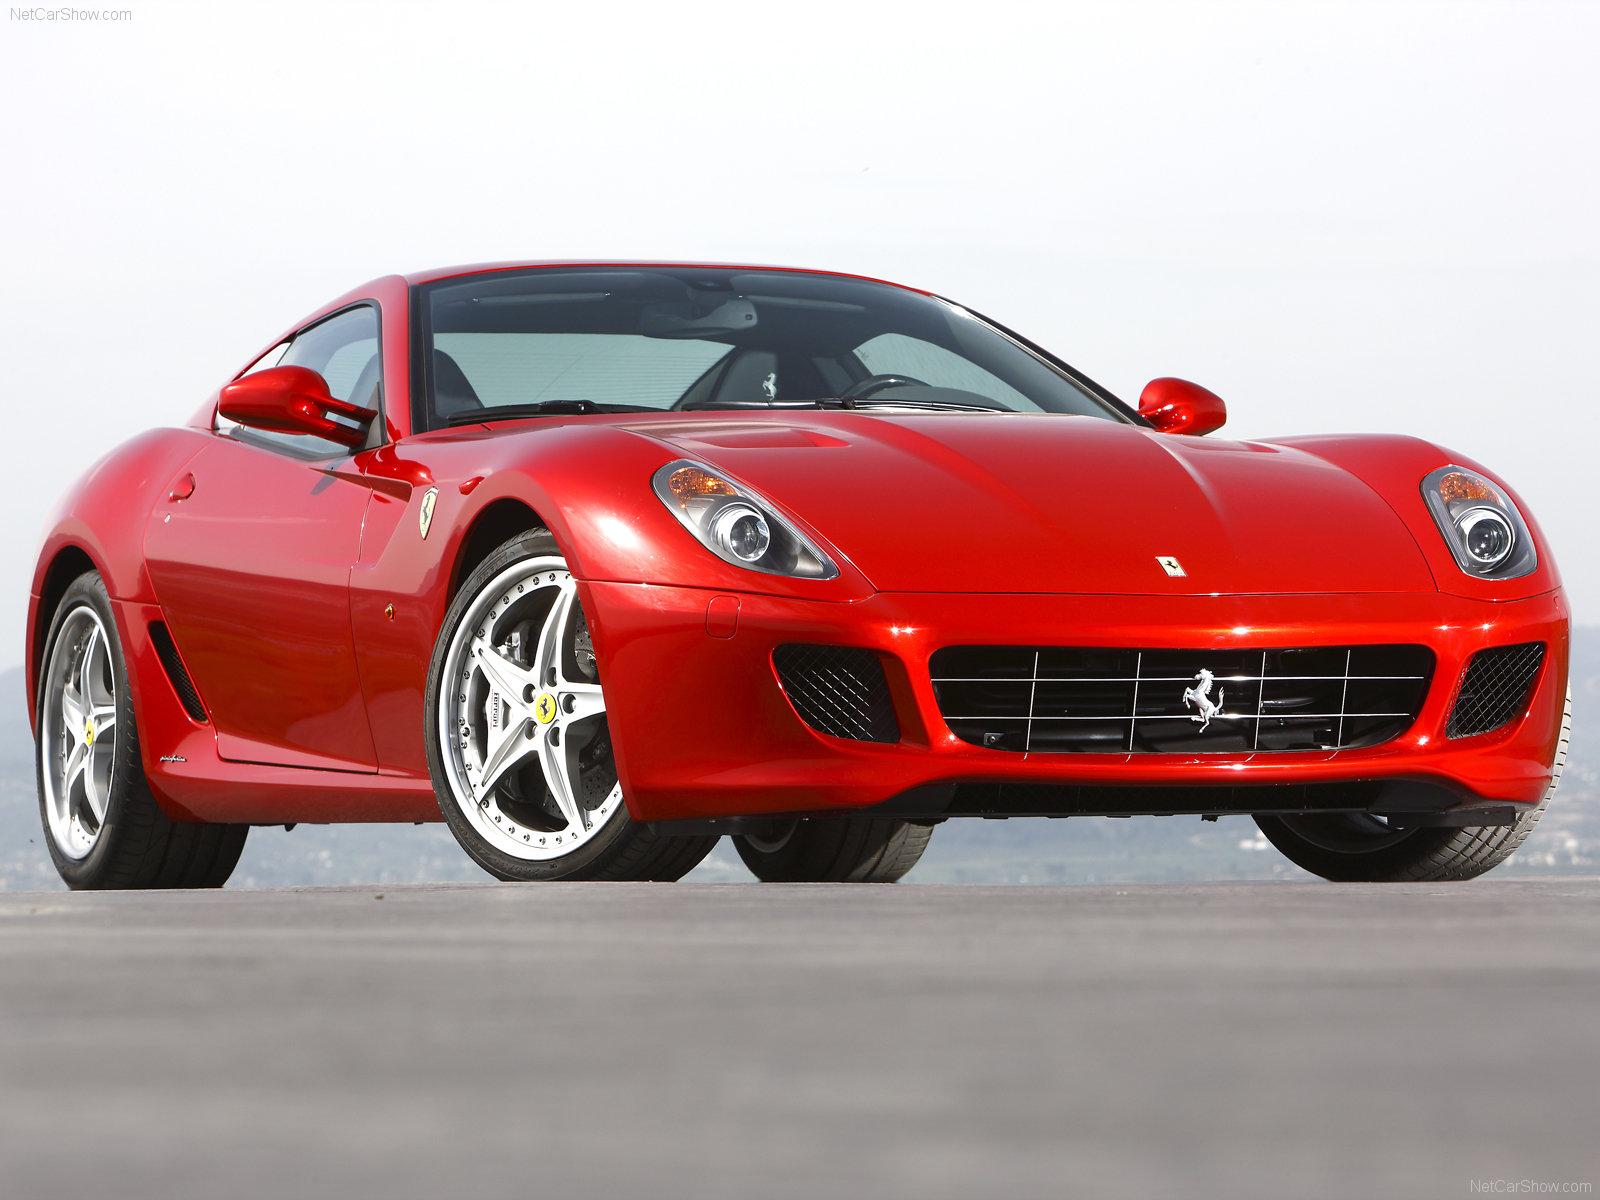 Ferrari 599 GTB Fiorano HGTE picture  65251  Ferrari photo gallery